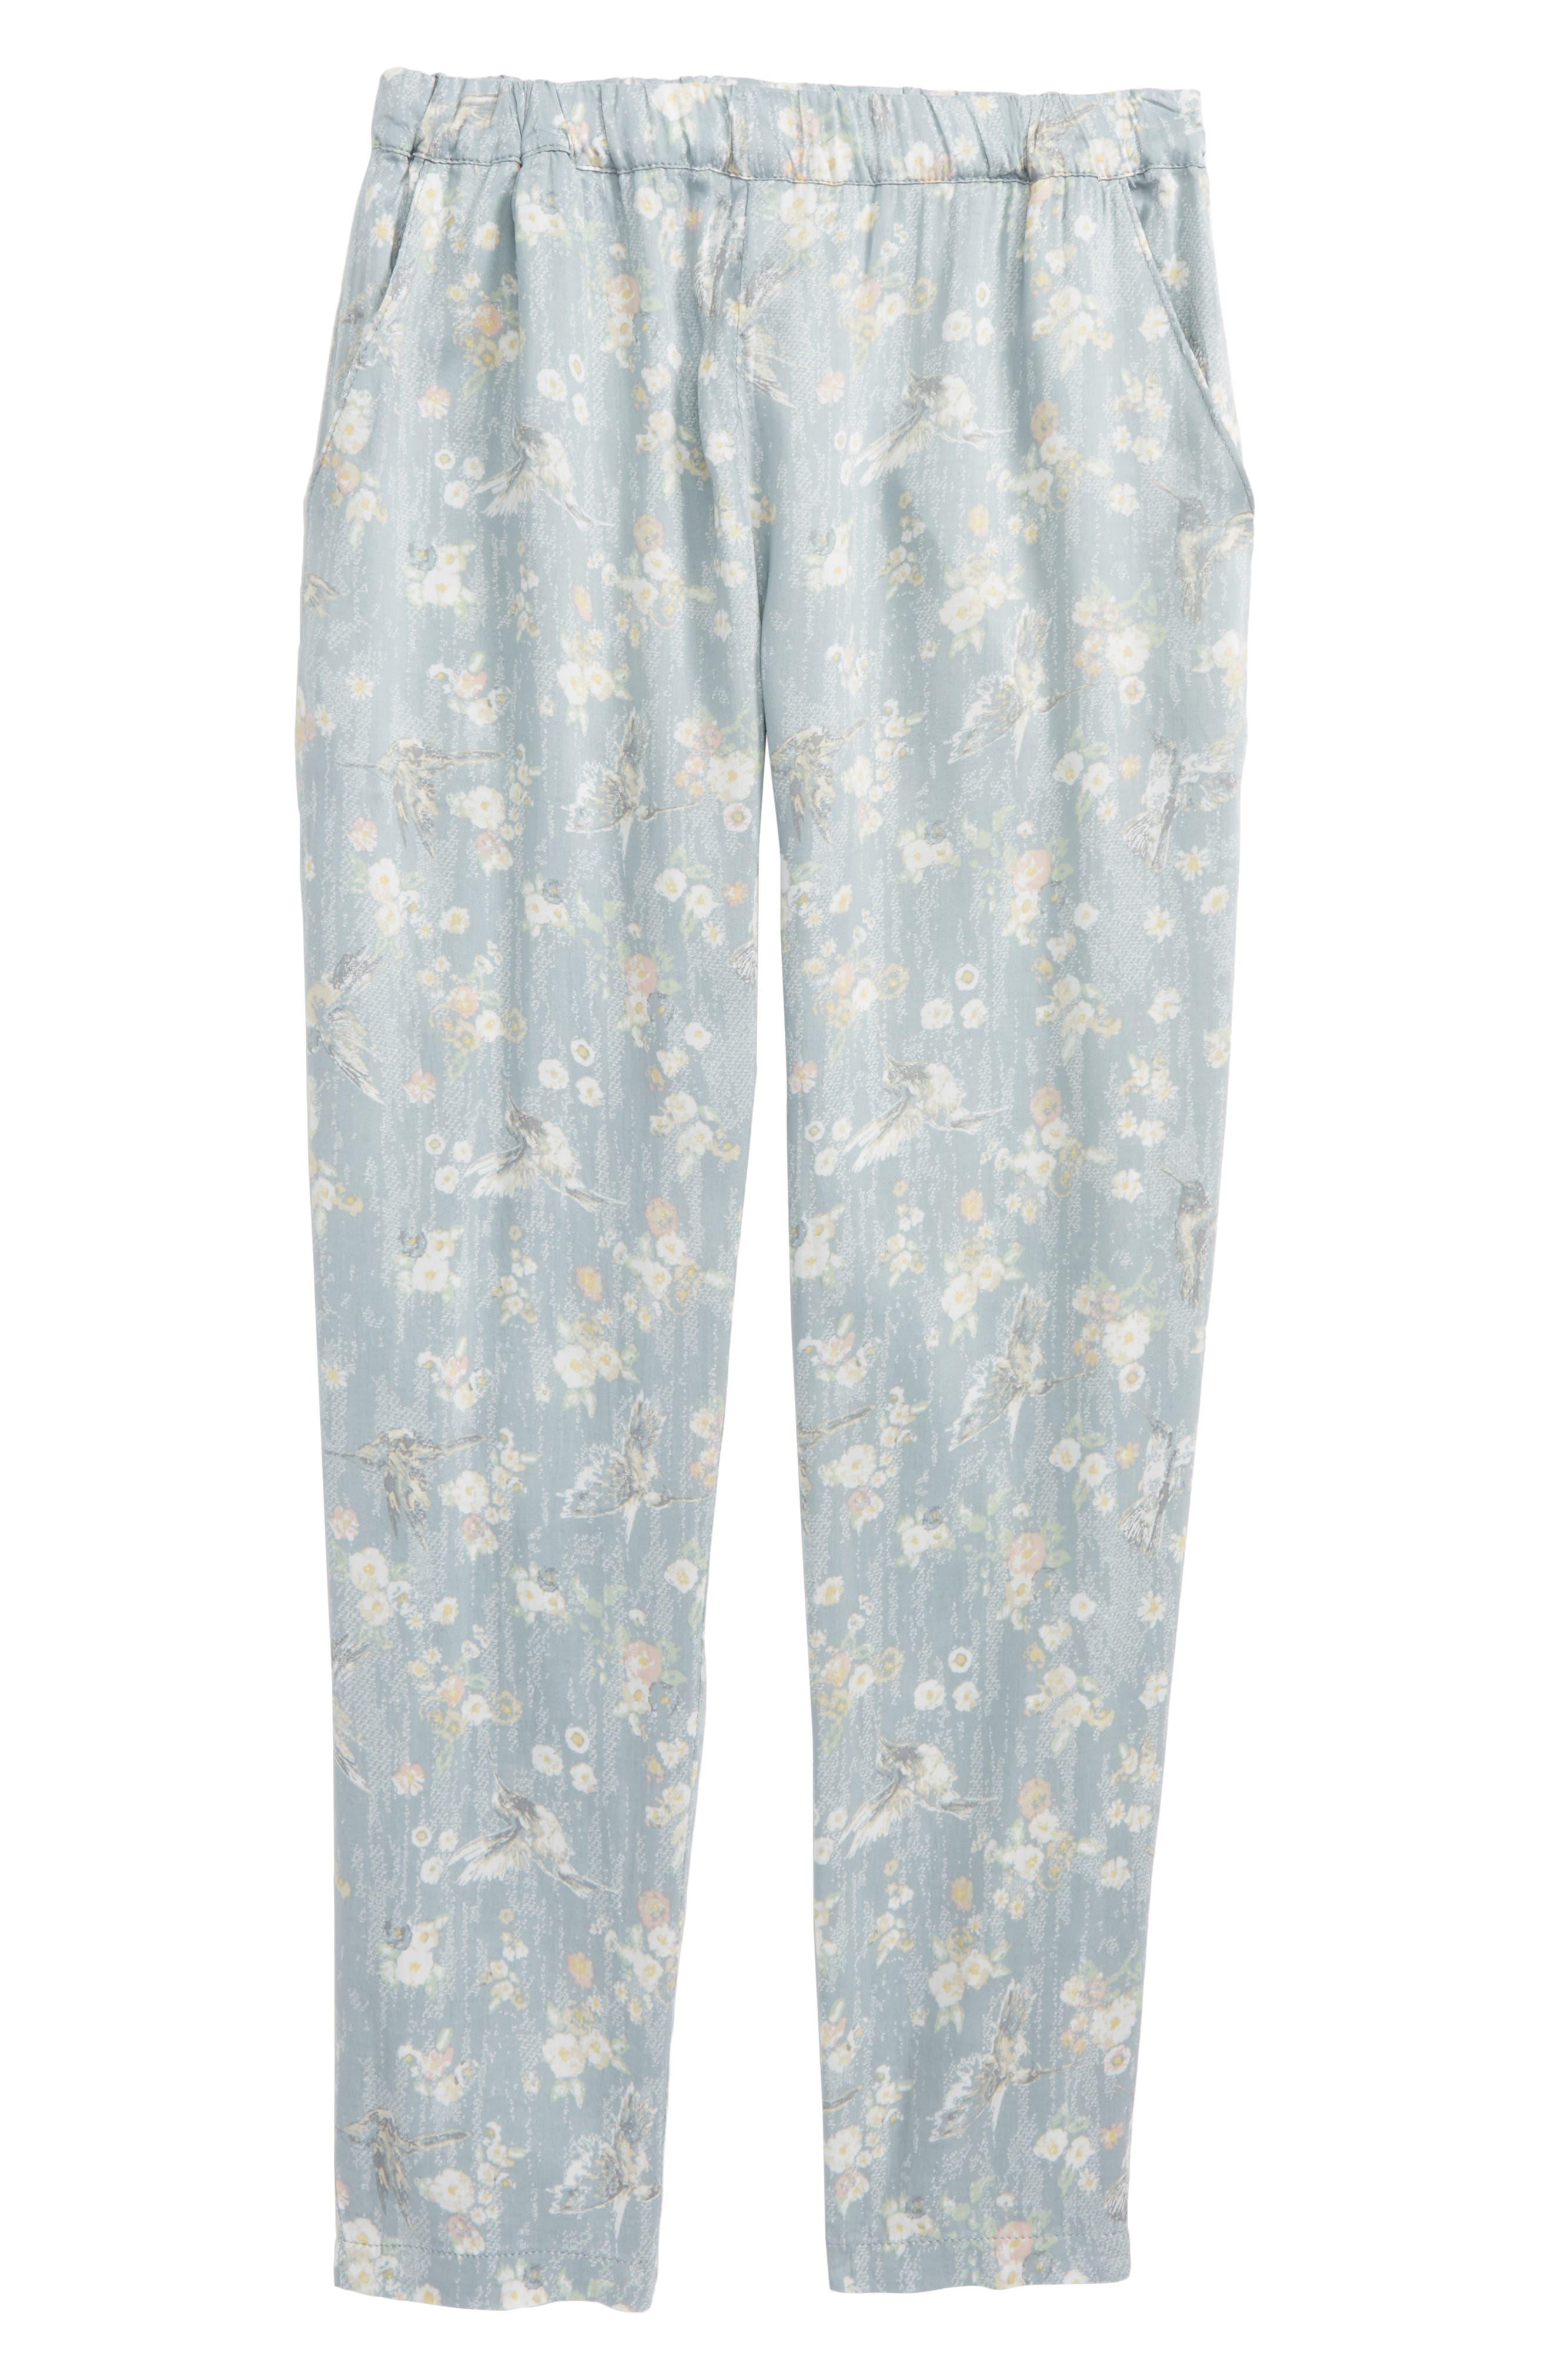 Wheat Sonia Floral Print Pants (Toddler Girls, Little Girls & Big Girls)